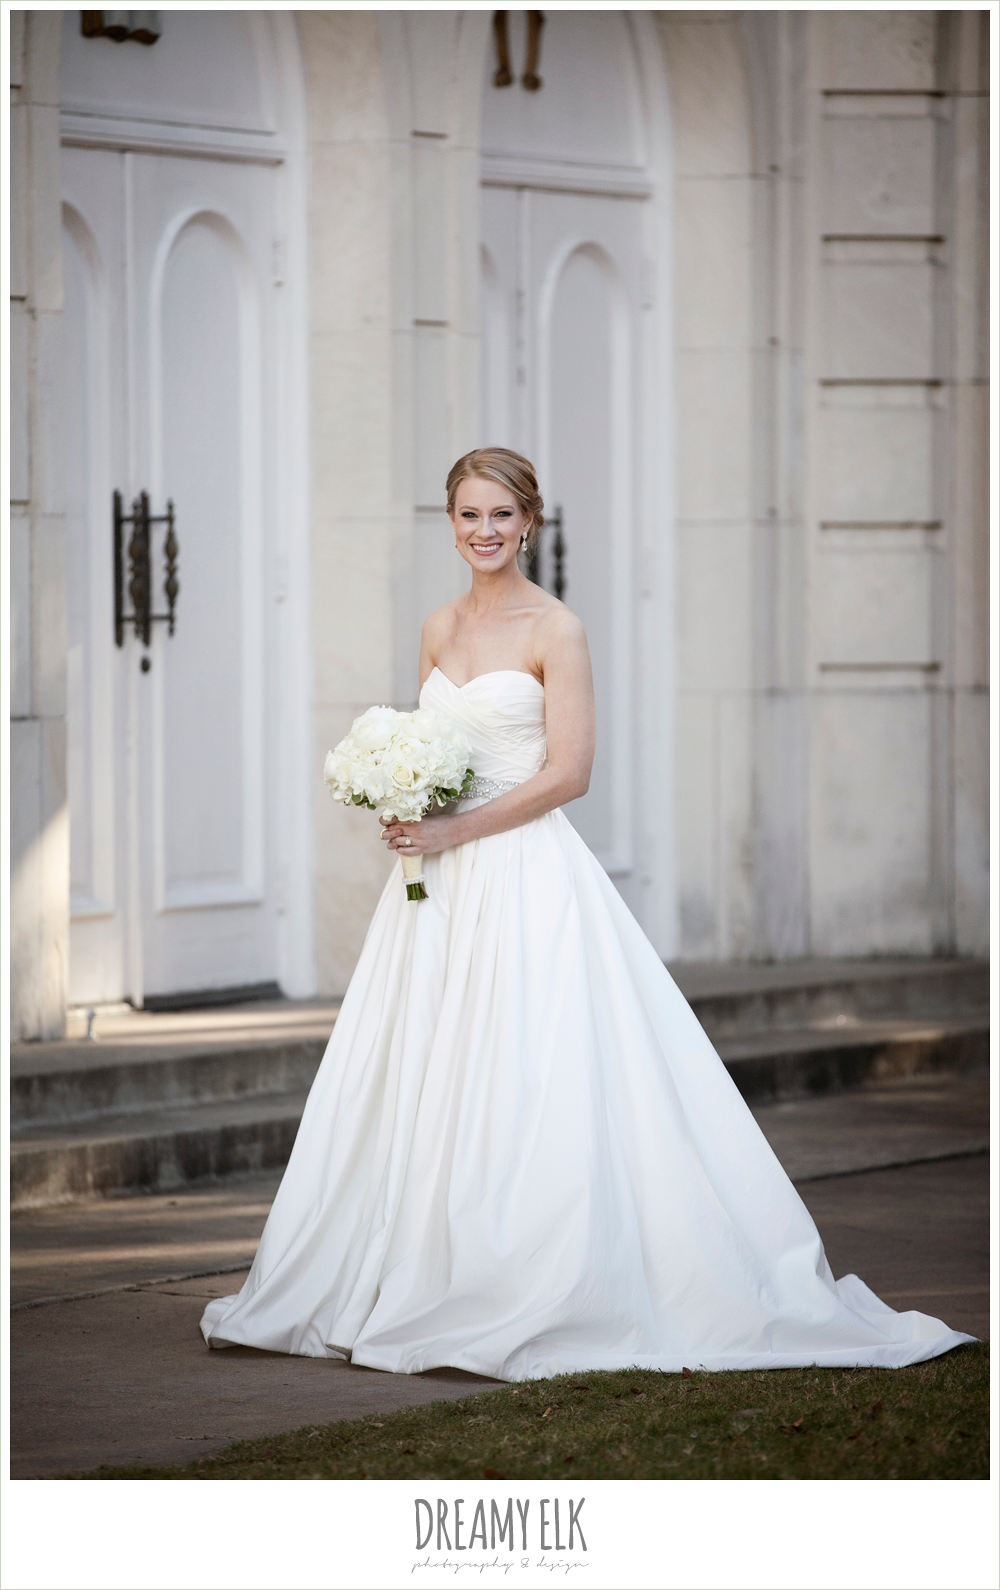 sweetheart strapless wedding dress, white wedding bouquet, winter wedding, austin wedding photographer, dreamy elk photography and design